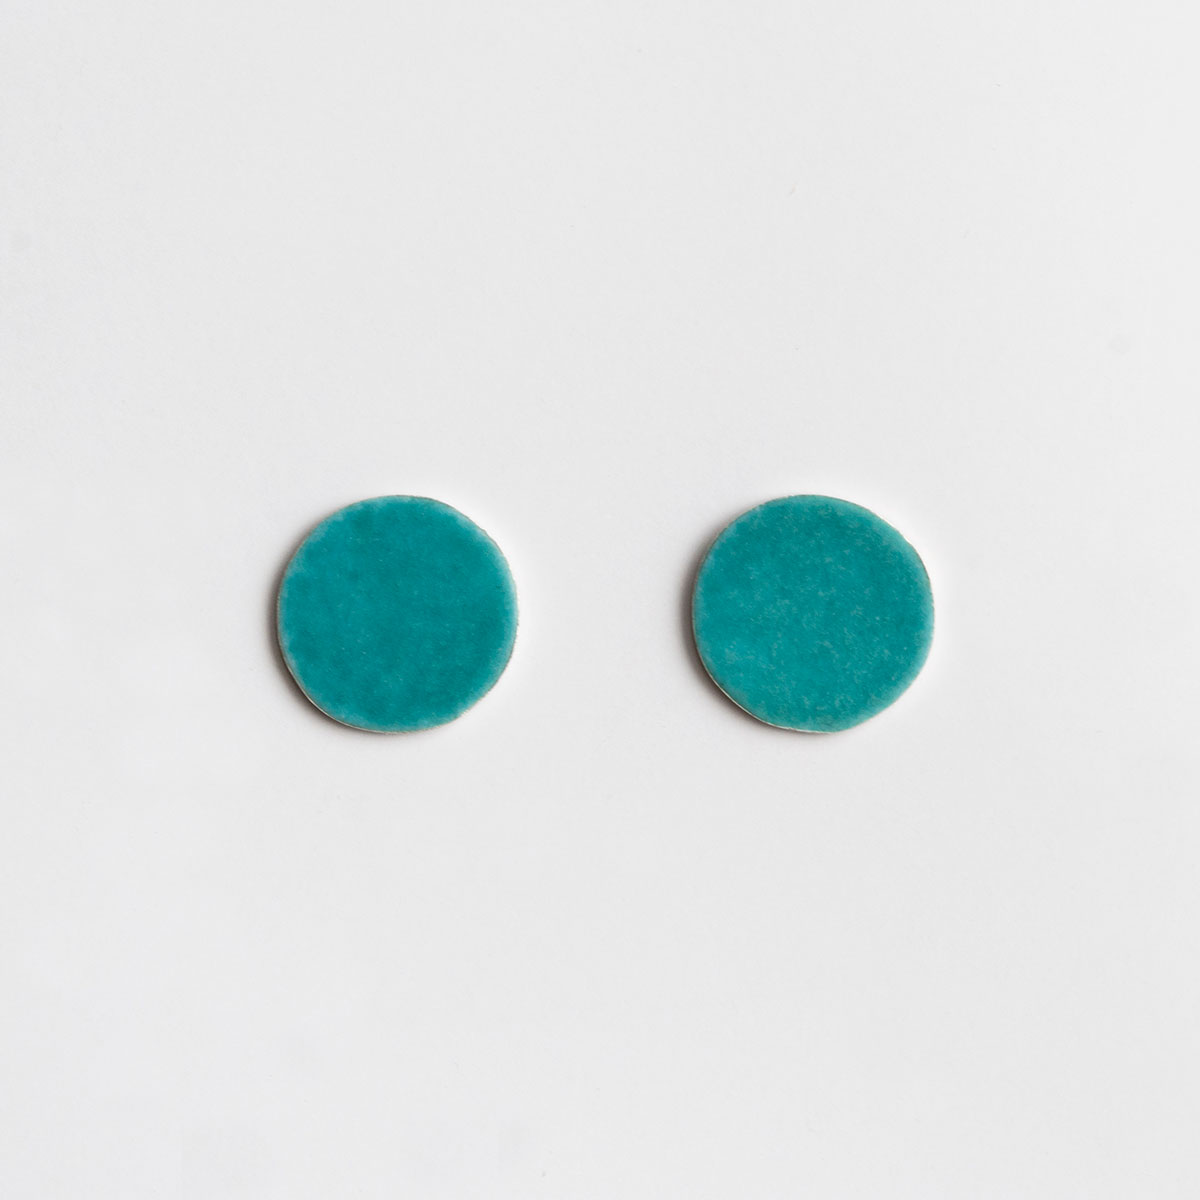 'Weave' Turquoise Dot Stud Earrings, Medium